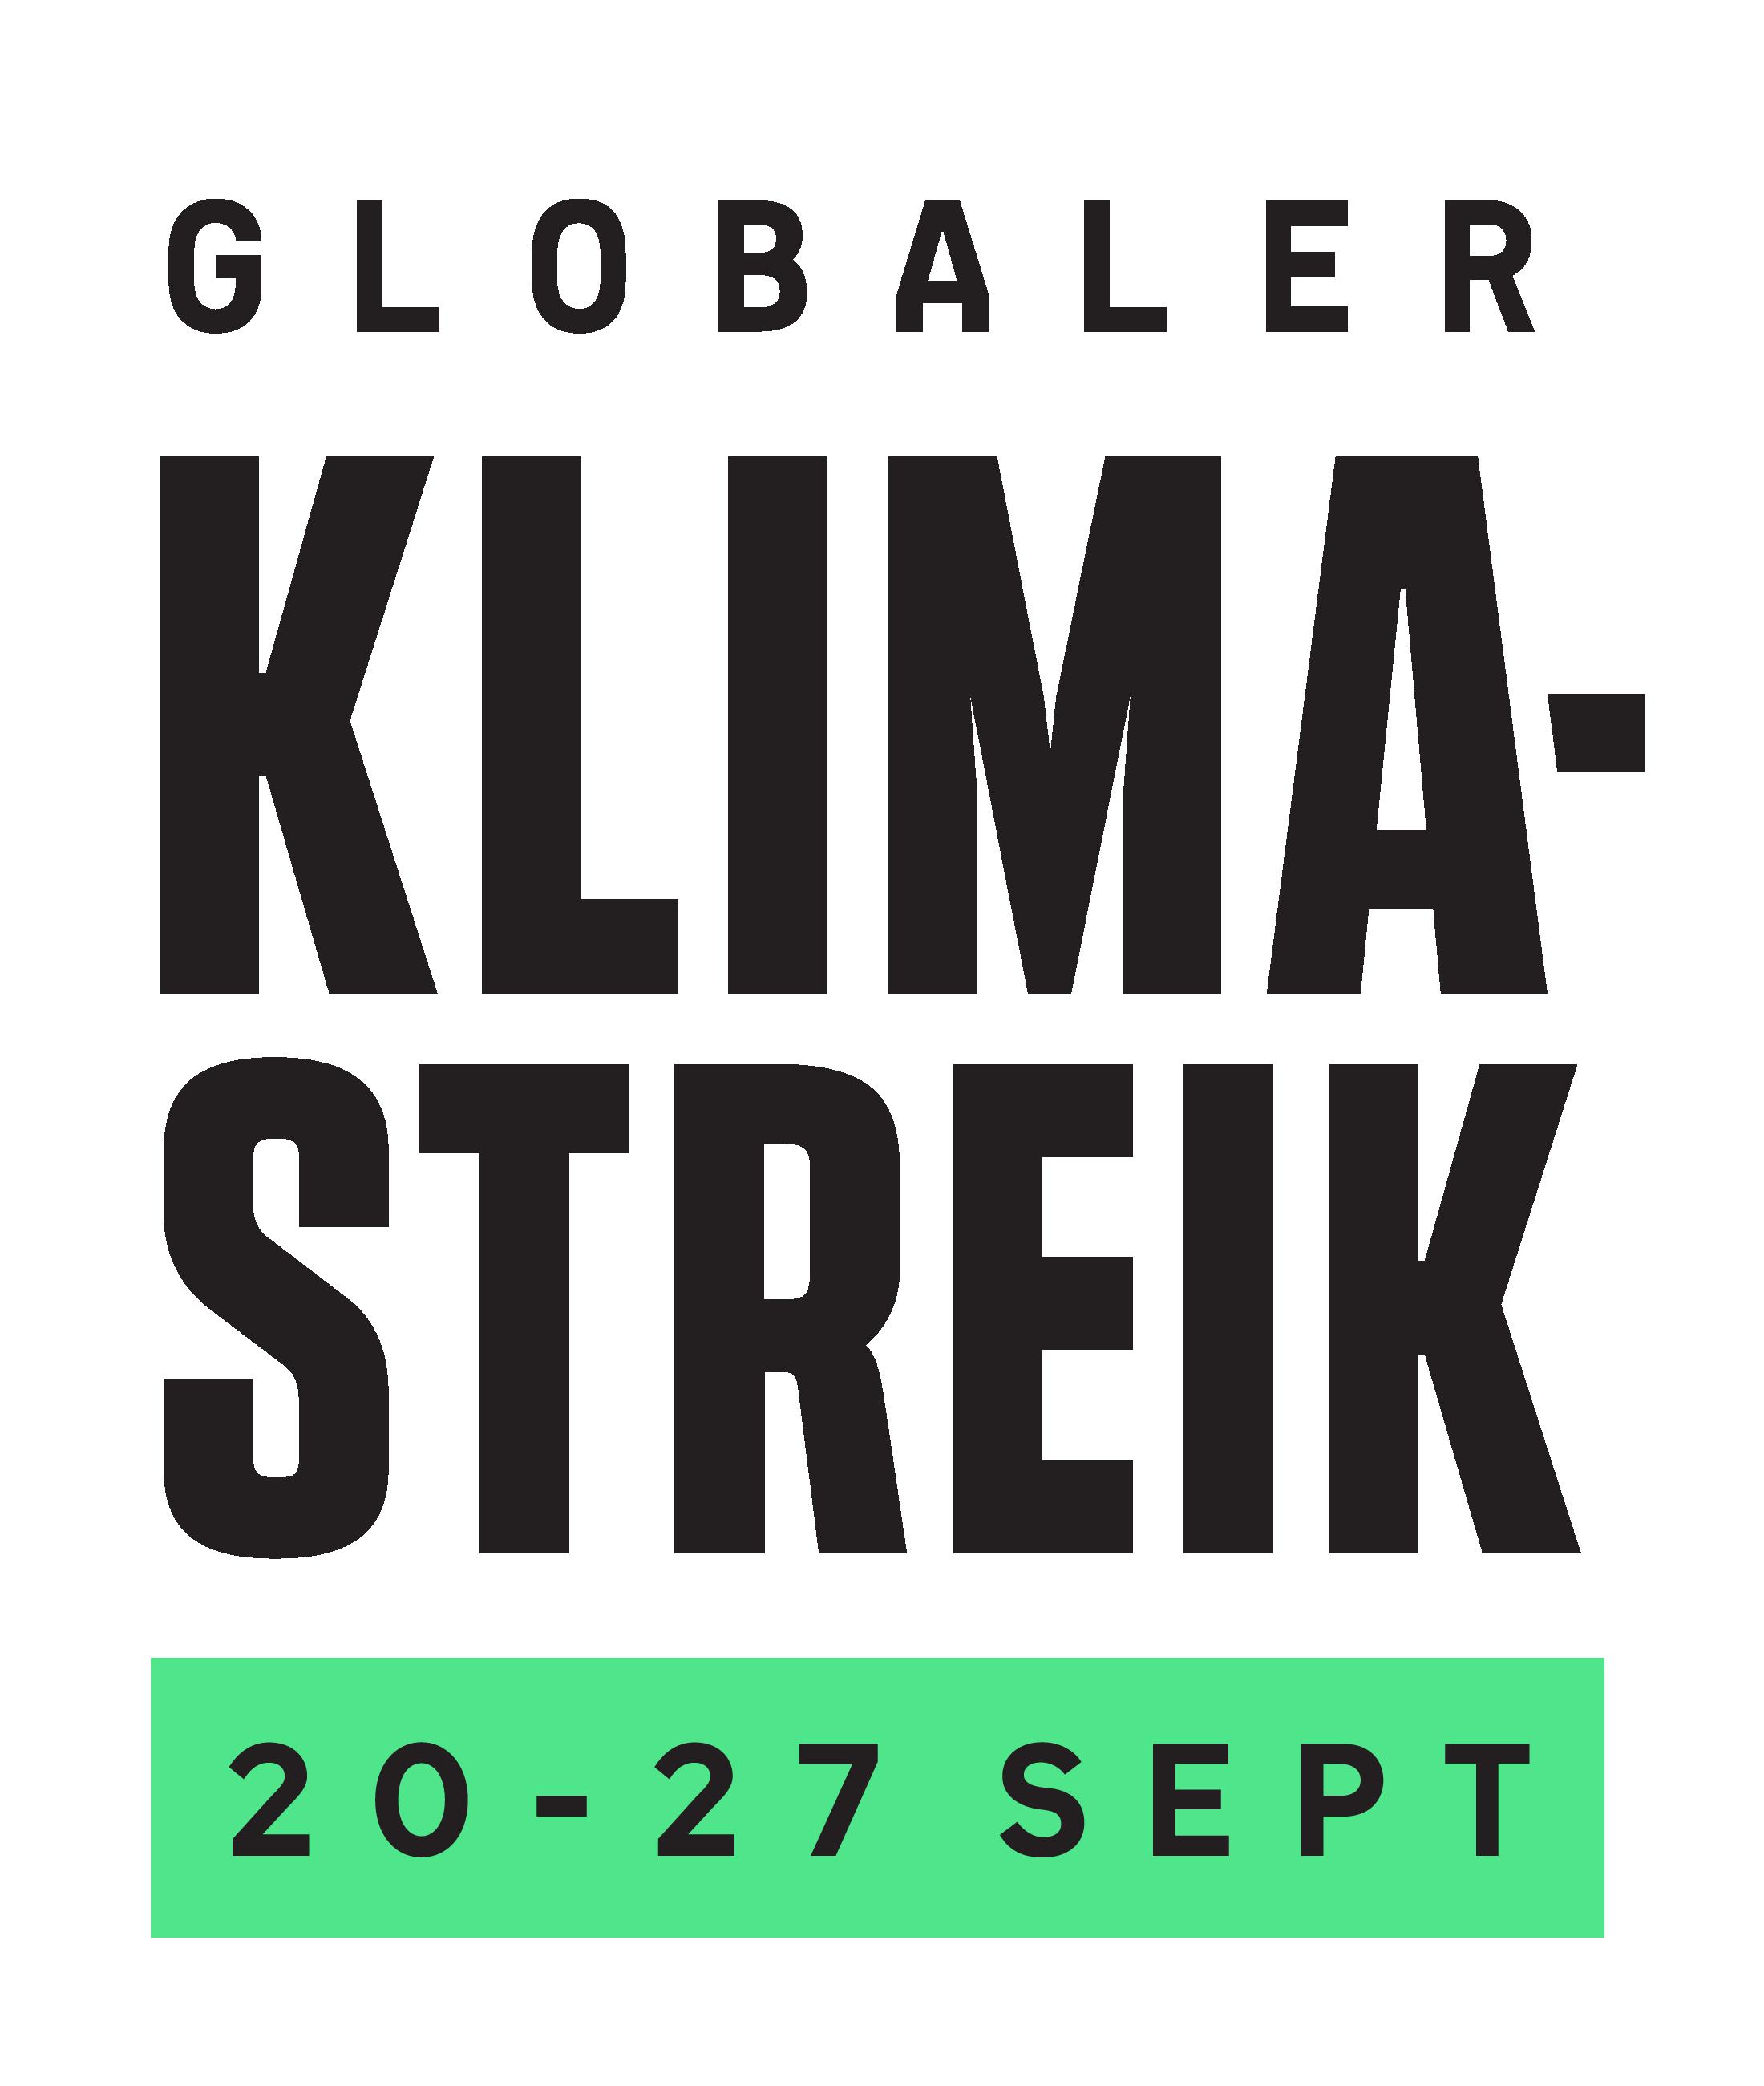 Globaler Klimastreik